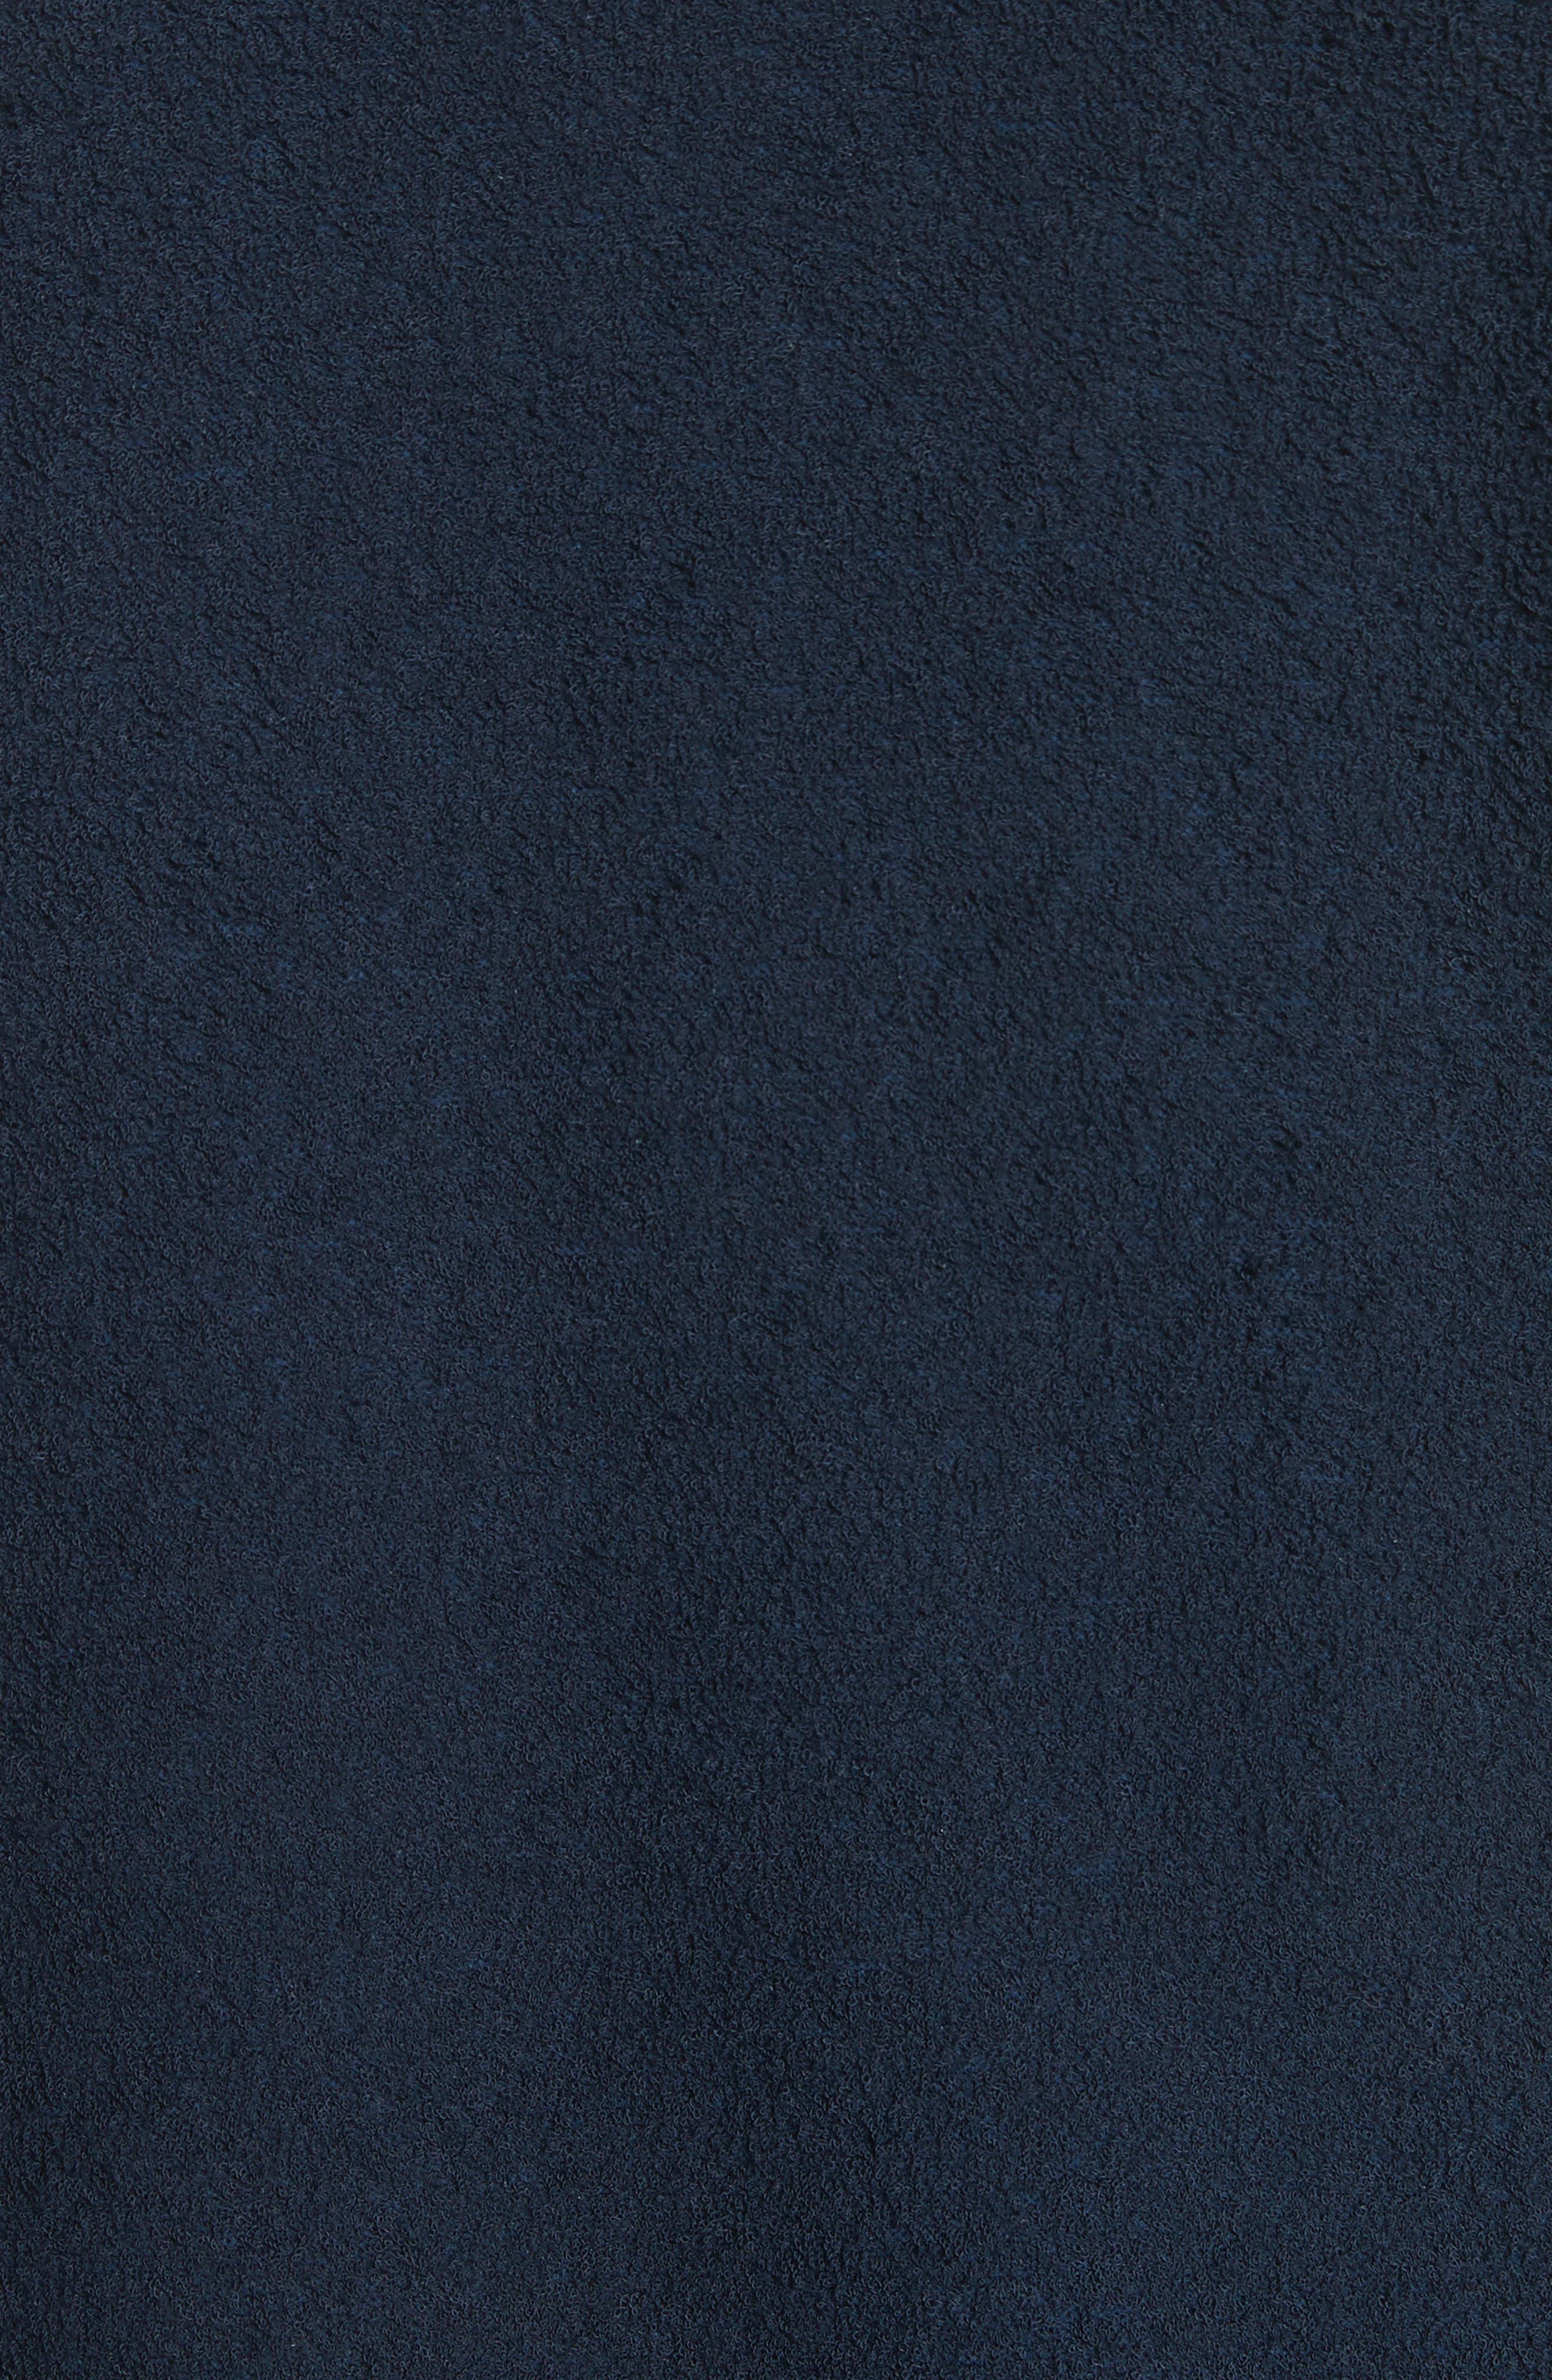 Rask Crewneck Sweatshirt,                             Alternate thumbnail 5, color,                             410